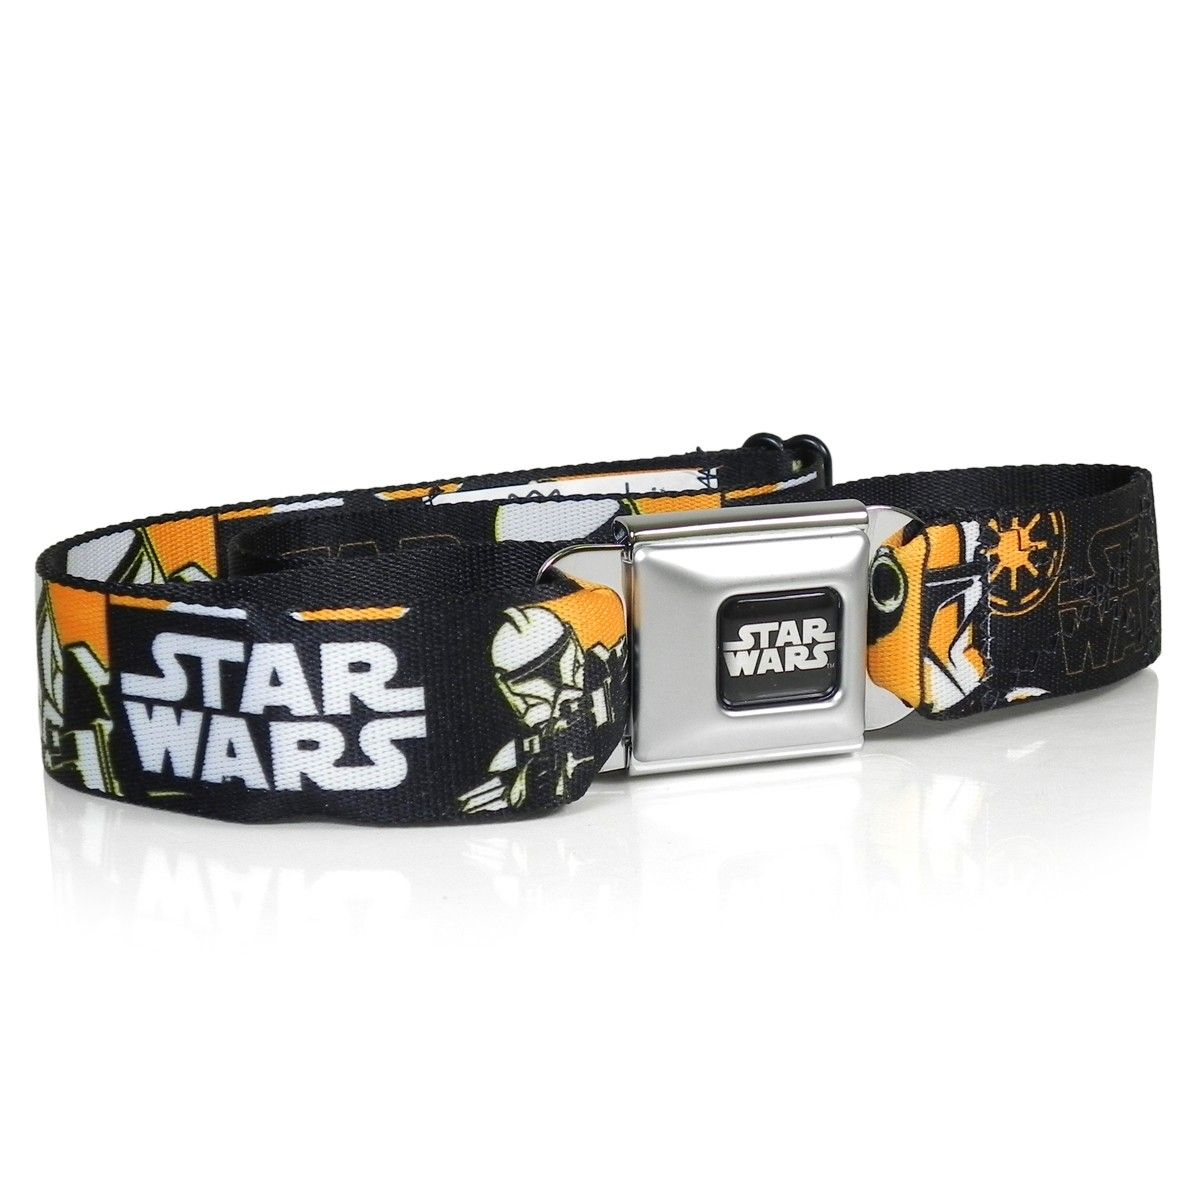 Star Wars Shooting Stormtrooper Auto Seatbelt Buckle Strap